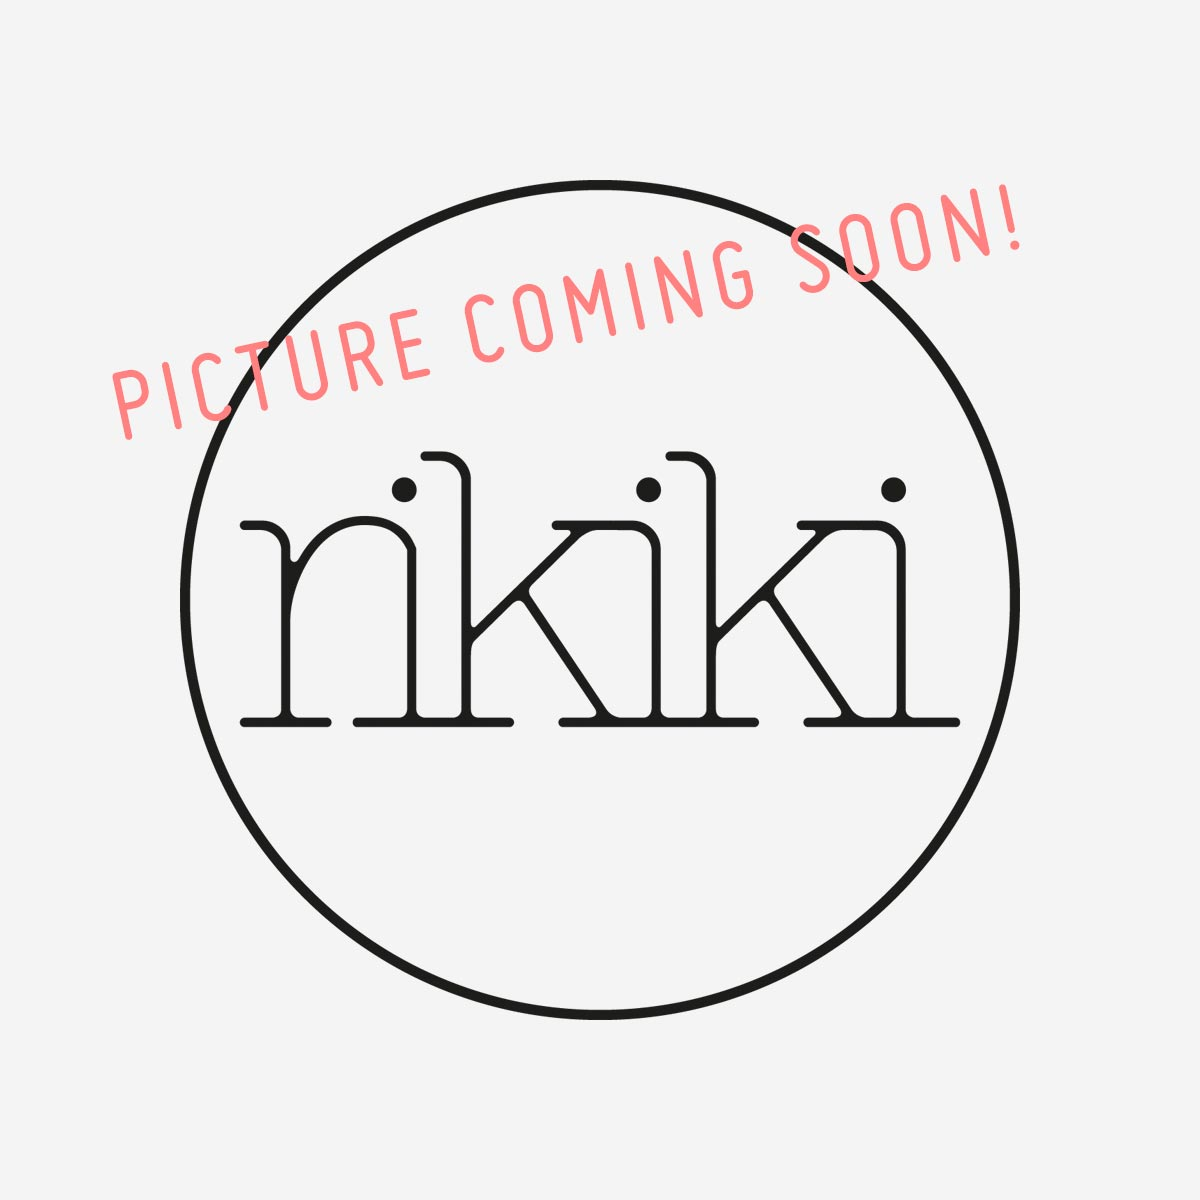 Rikiki grafik produkt foil koala greeting card i ended up here foil koala greeting card m4hsunfo